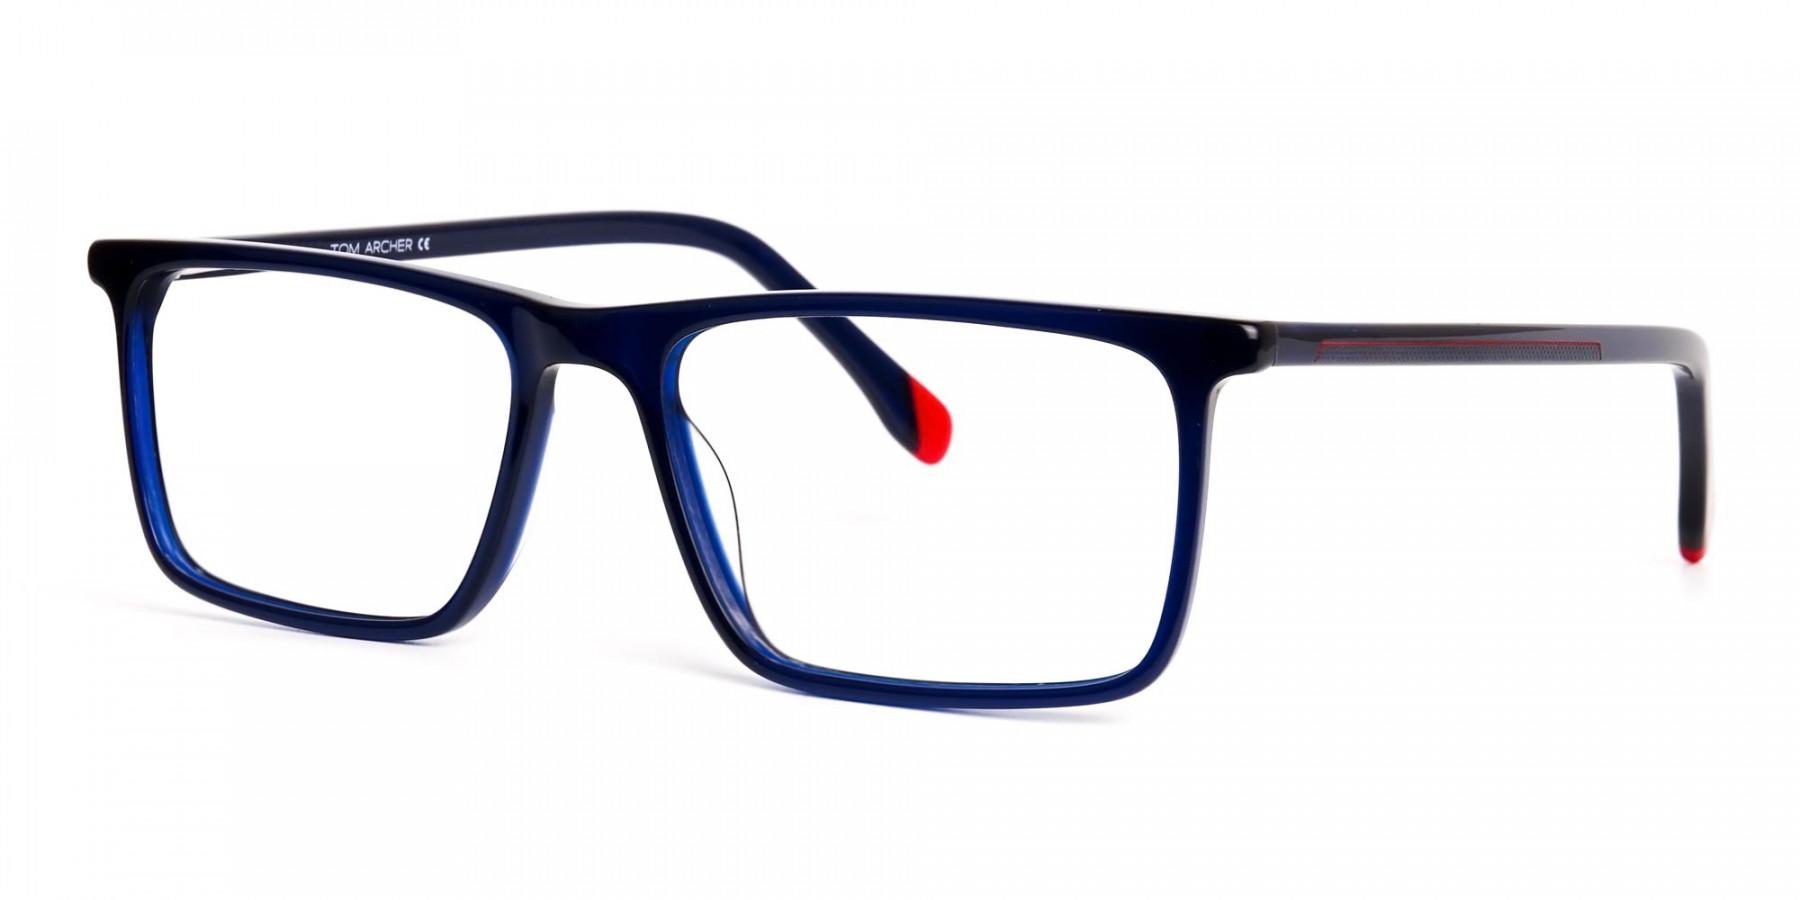 blue-and-red-rectangular-glasses-frames-1